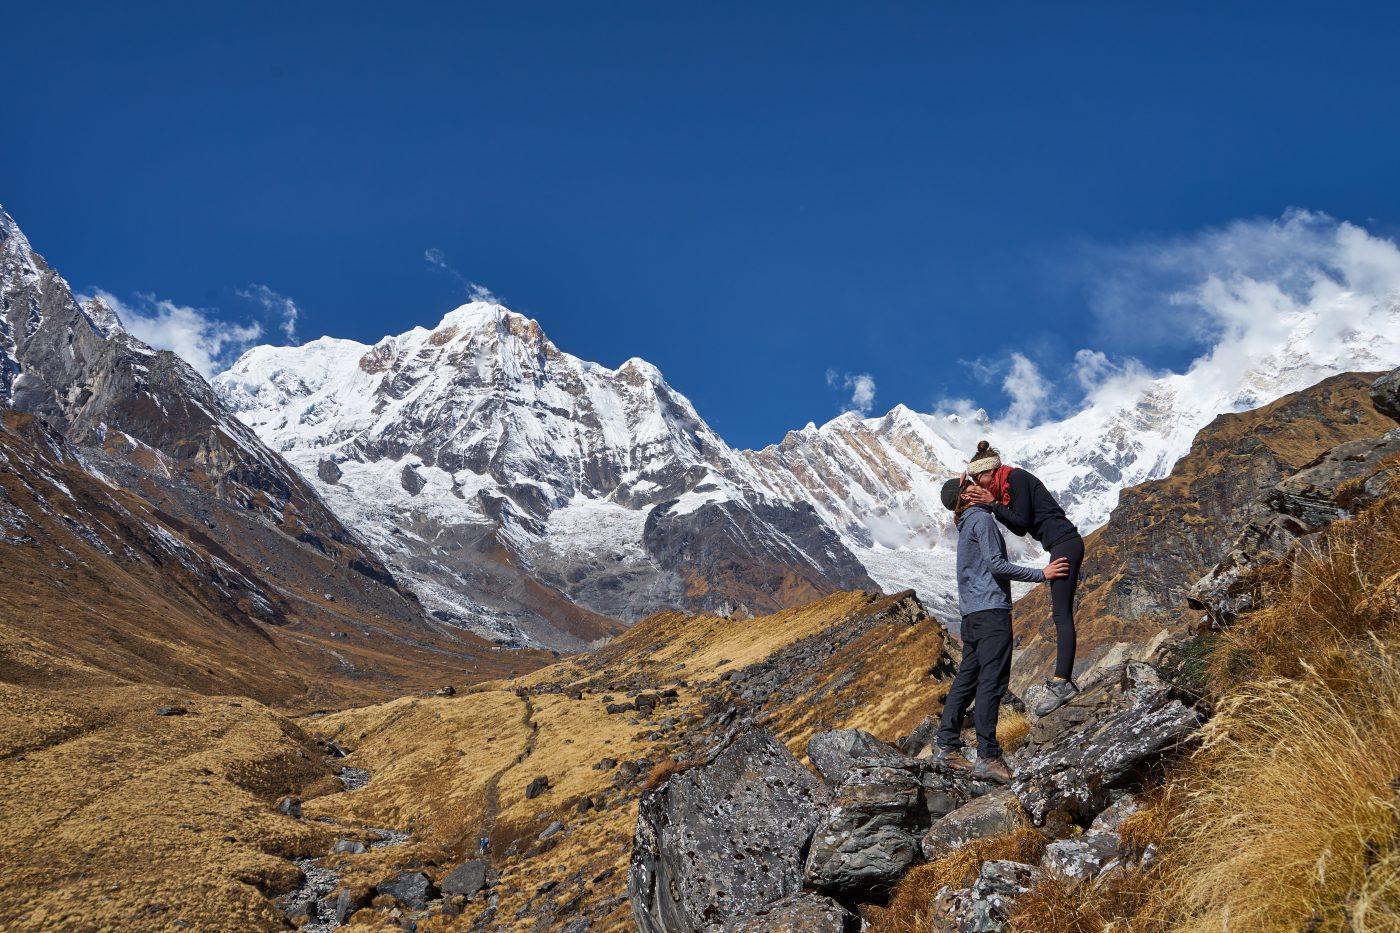 Minimalism: Annapurna